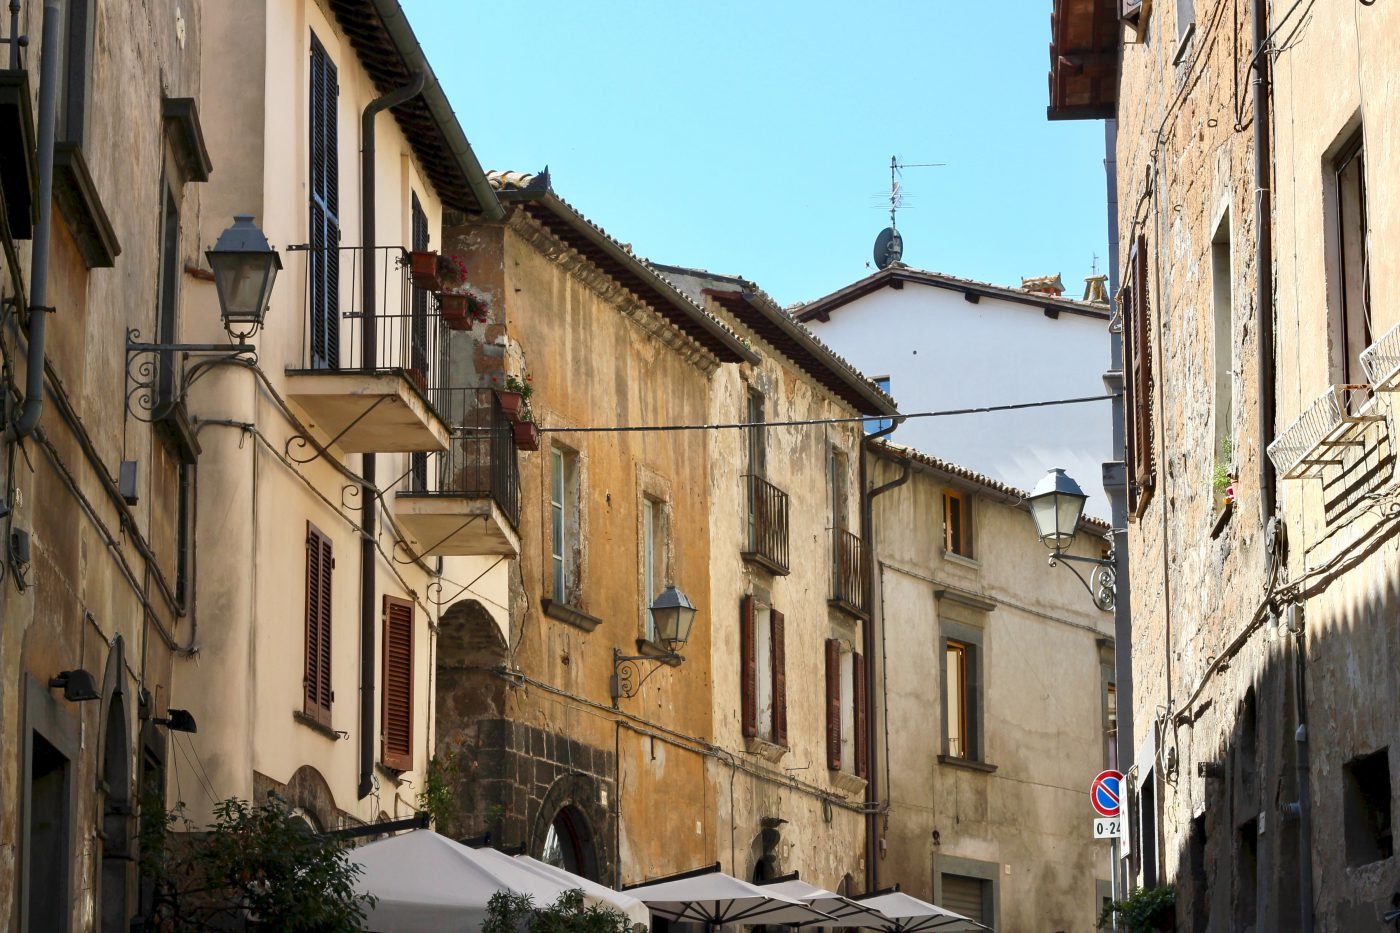 Through the streets of Terni - Umbria